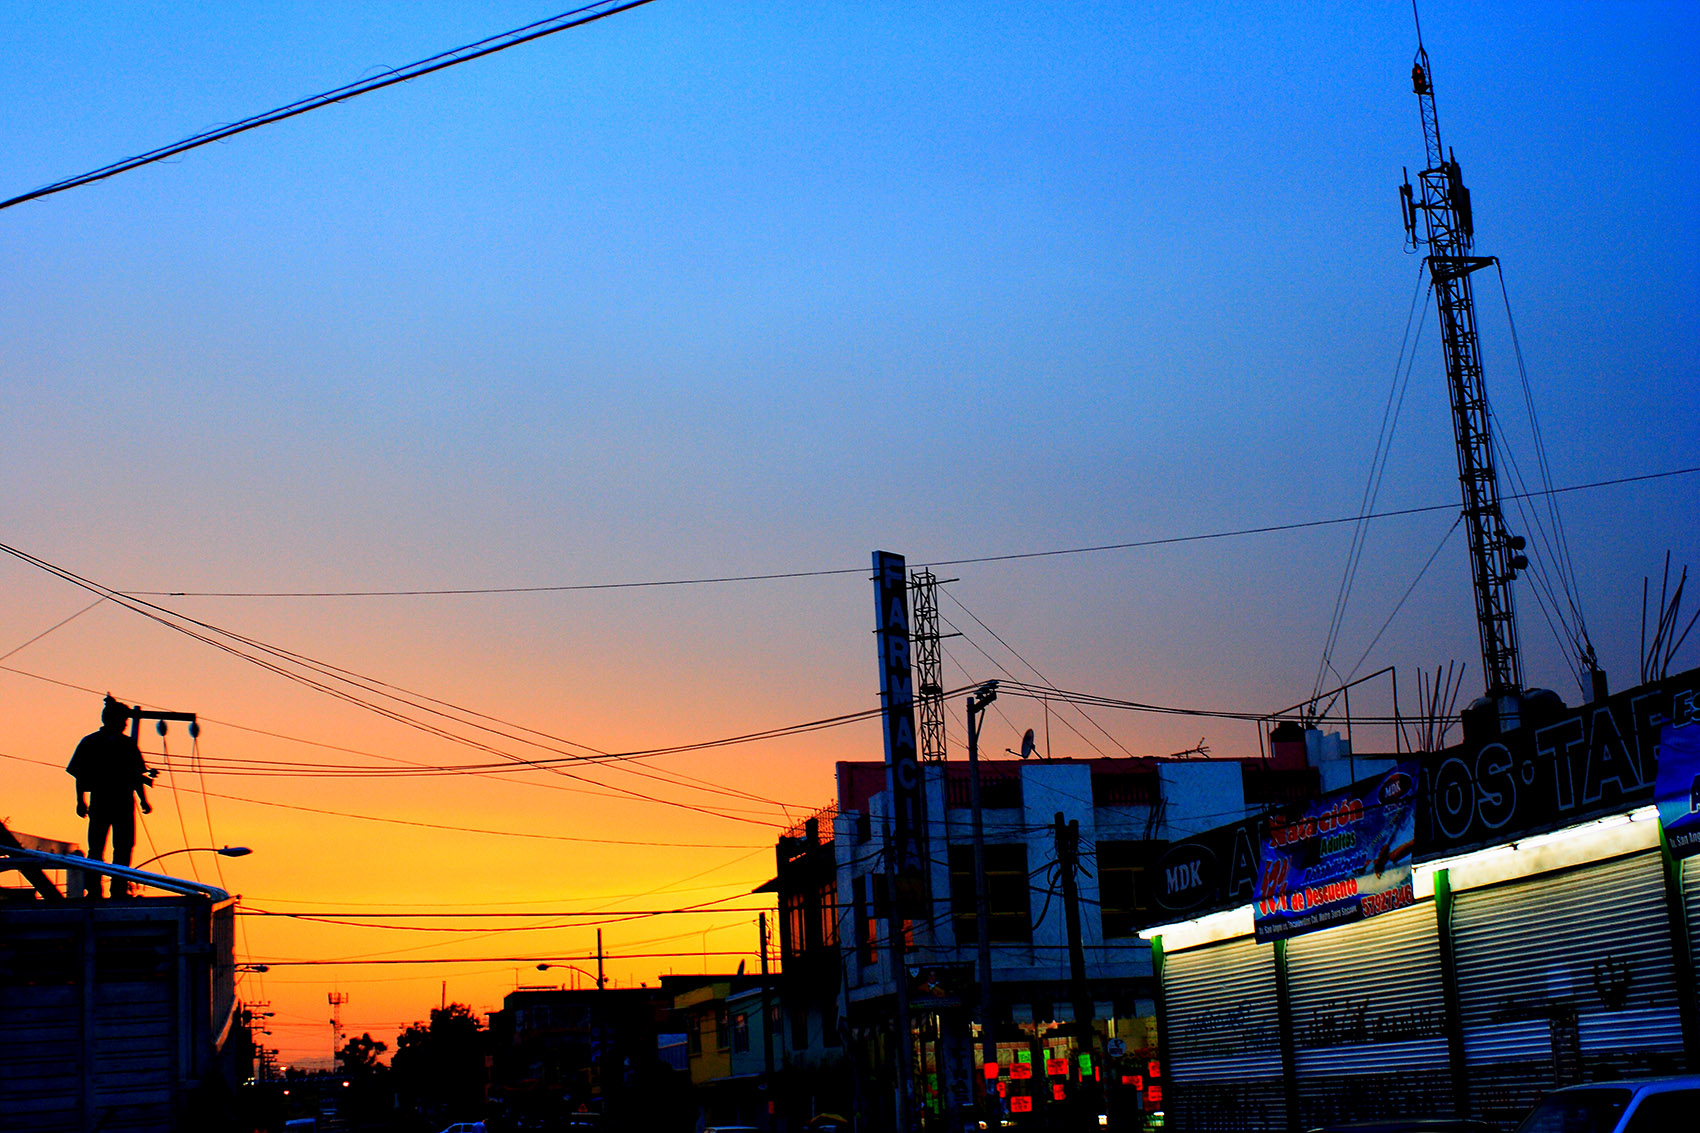 Street Photography en Cd. Nezahualcóyotl por Ockesaid a.k.a Joel Lugo - Street Photographer